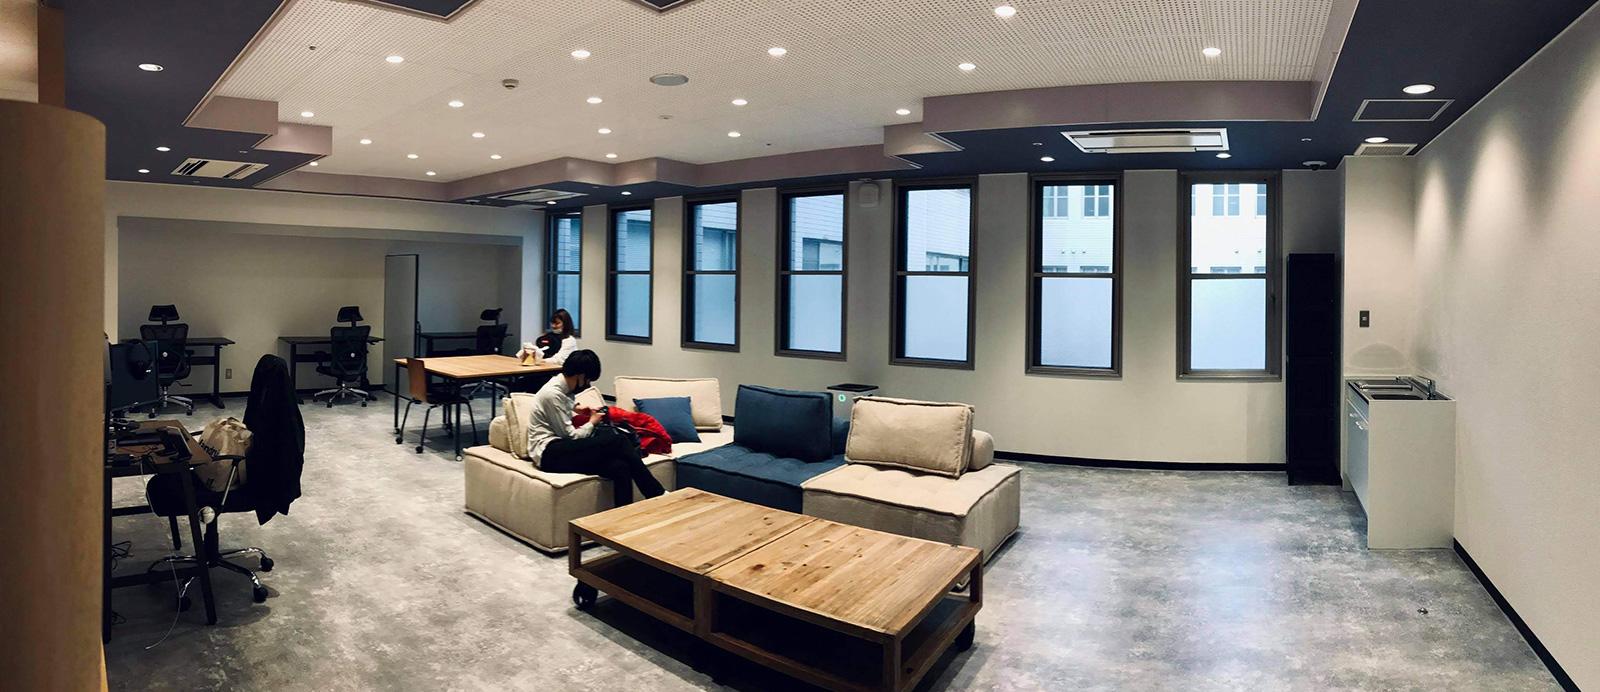 [CCH News Vol.1]リニューアルオープンしたコンピュータクラブハウス加賀をご紹介